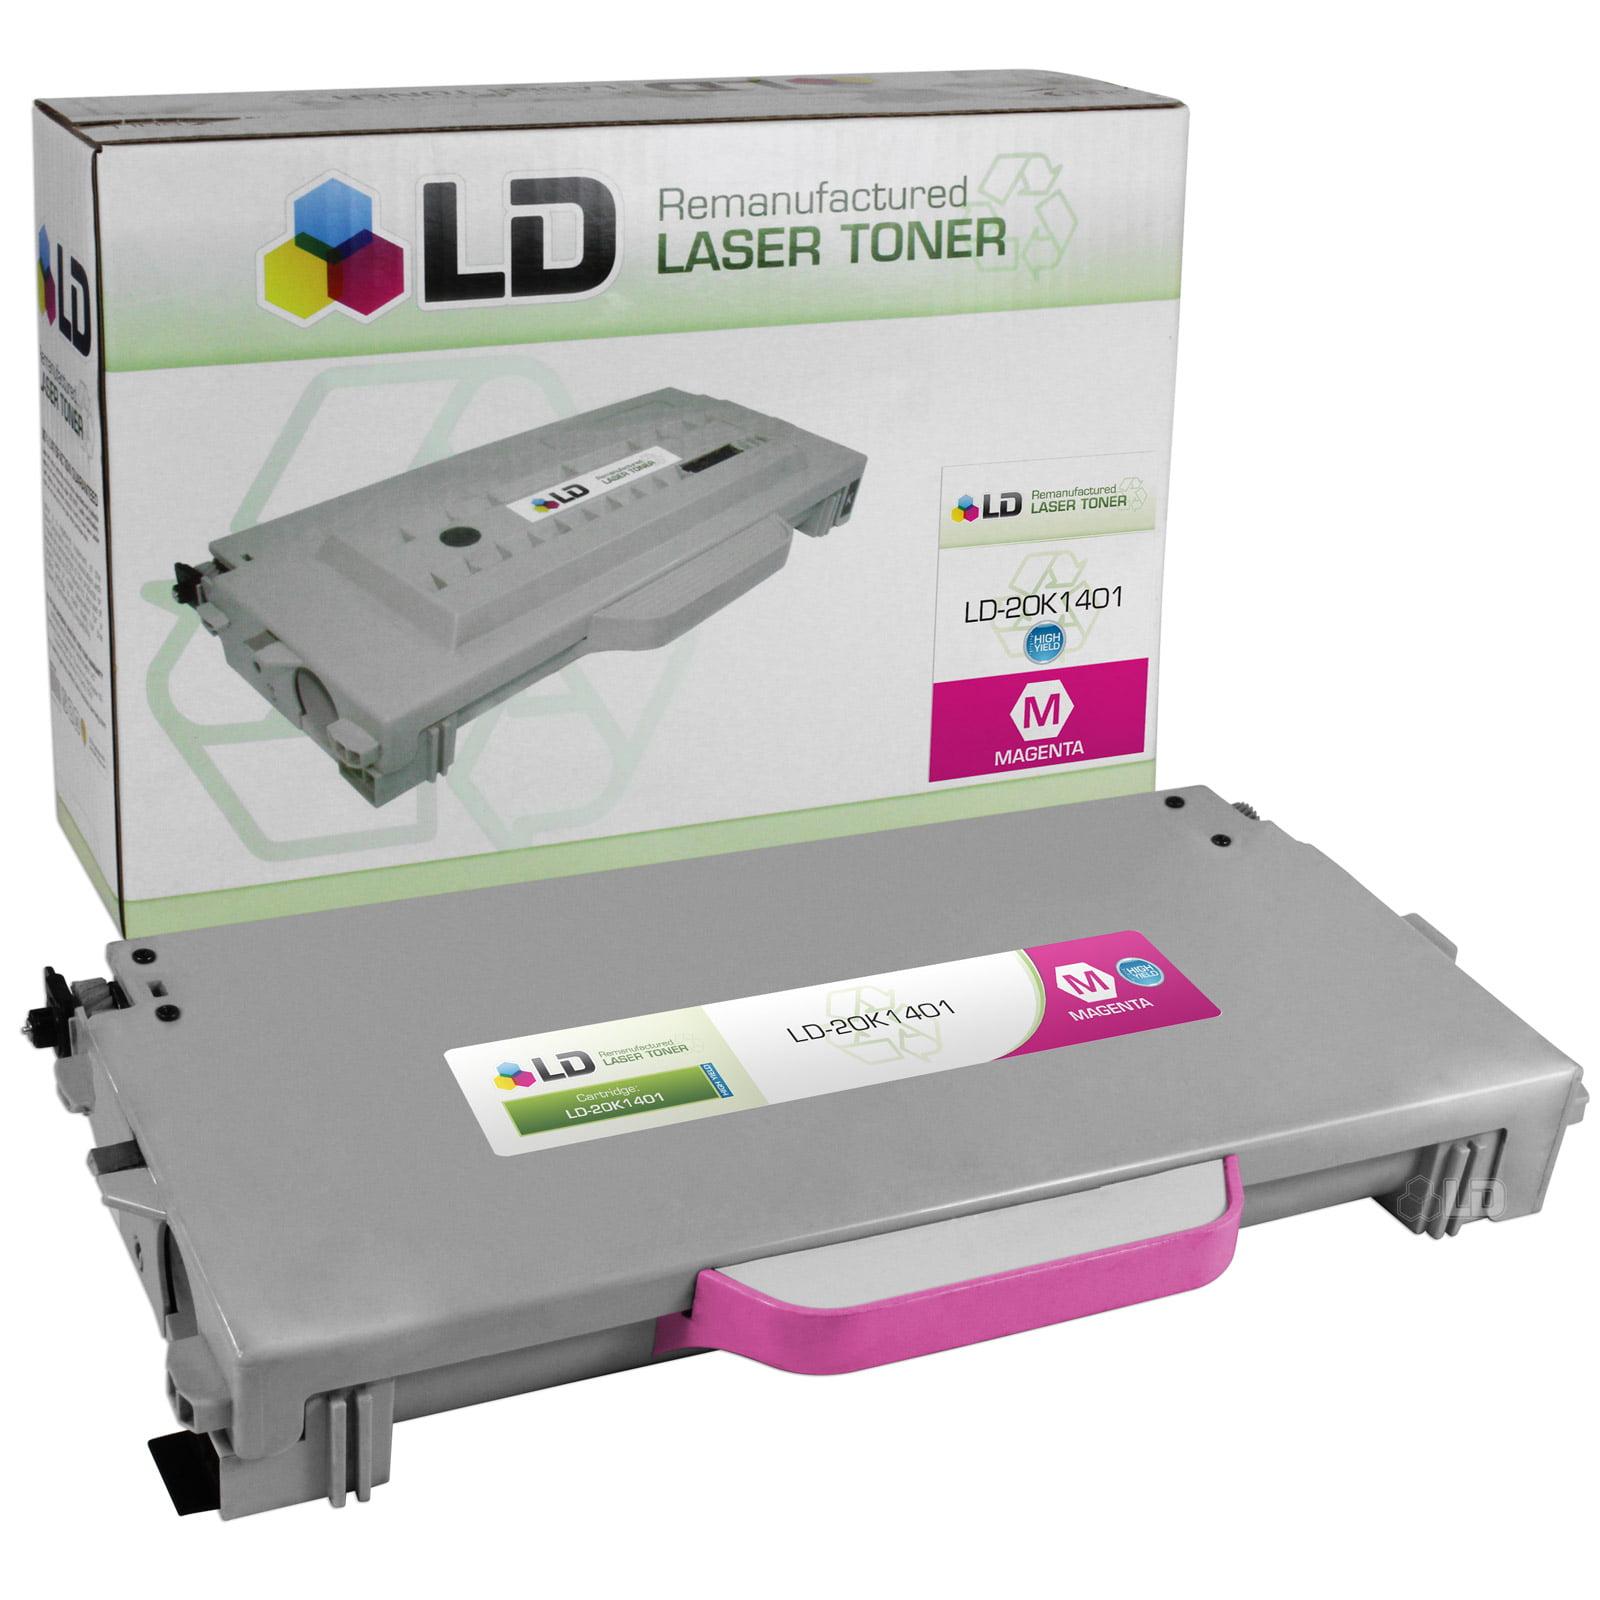 LD Remanufactured High Yield Magenta Laser Toner Cartridge for Lexmark 20K1401